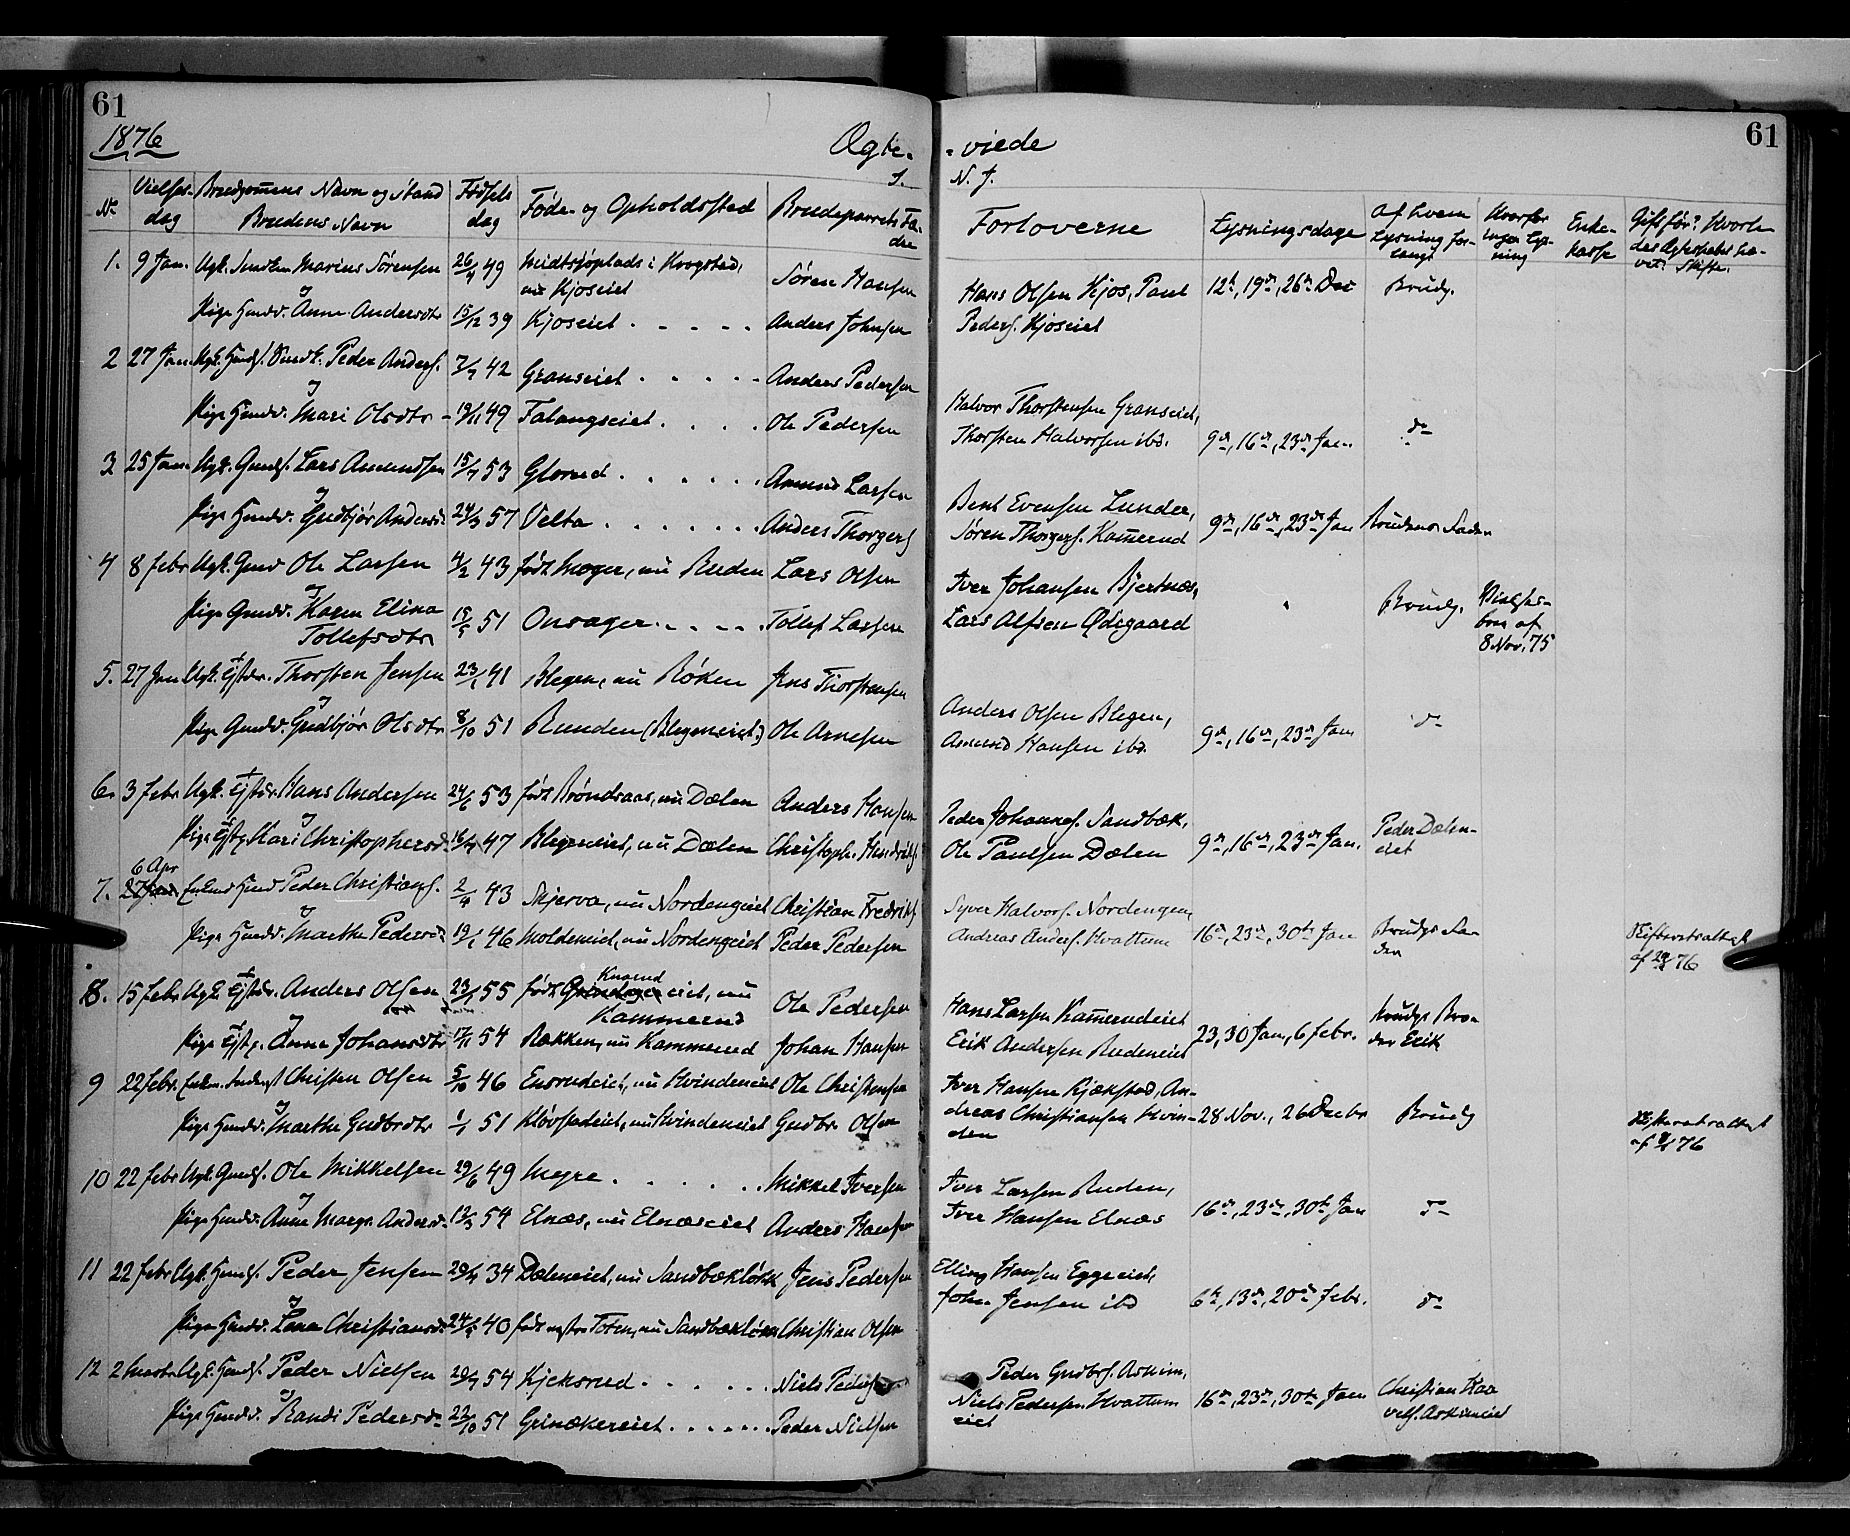 SAH, Gran prestekontor, Ministerialbok nr. 13, 1875-1879, s. 61